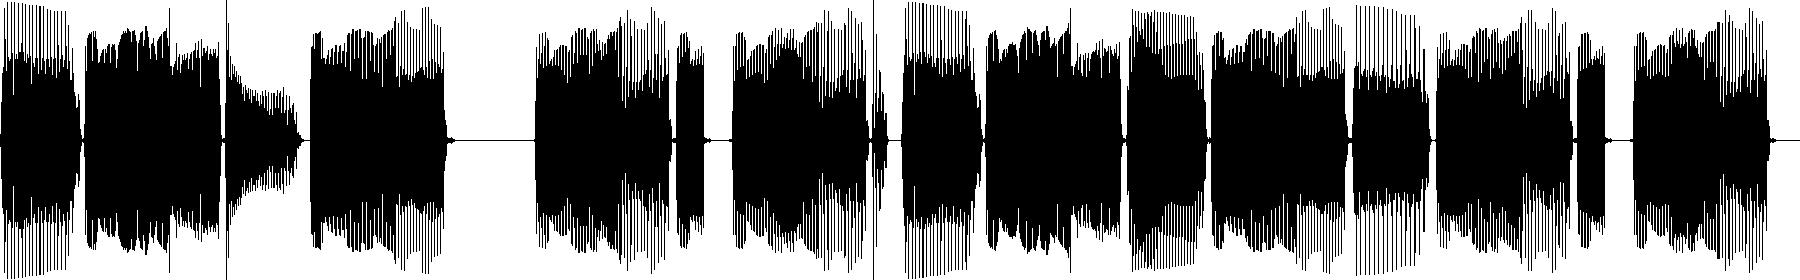 Moog Bass | Sample Focus